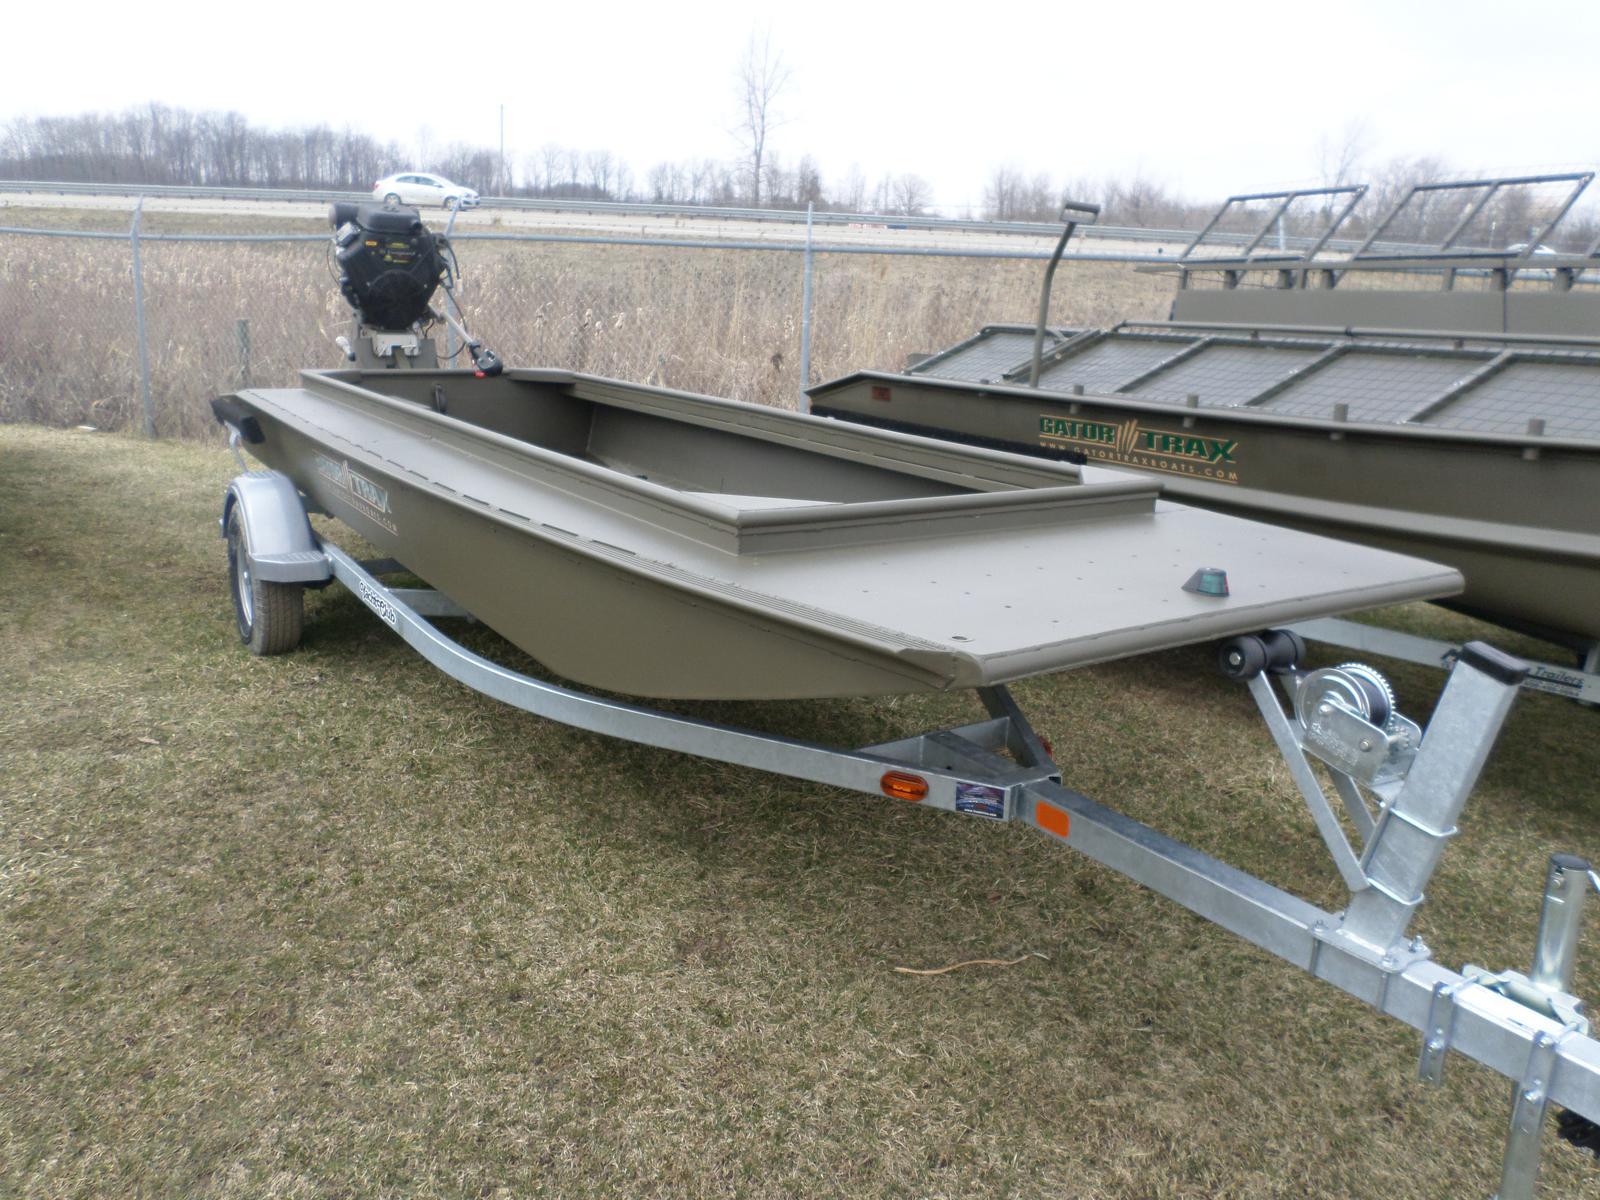 2018 Gator Trax 16 Marsh Series for sale in Fenton MI